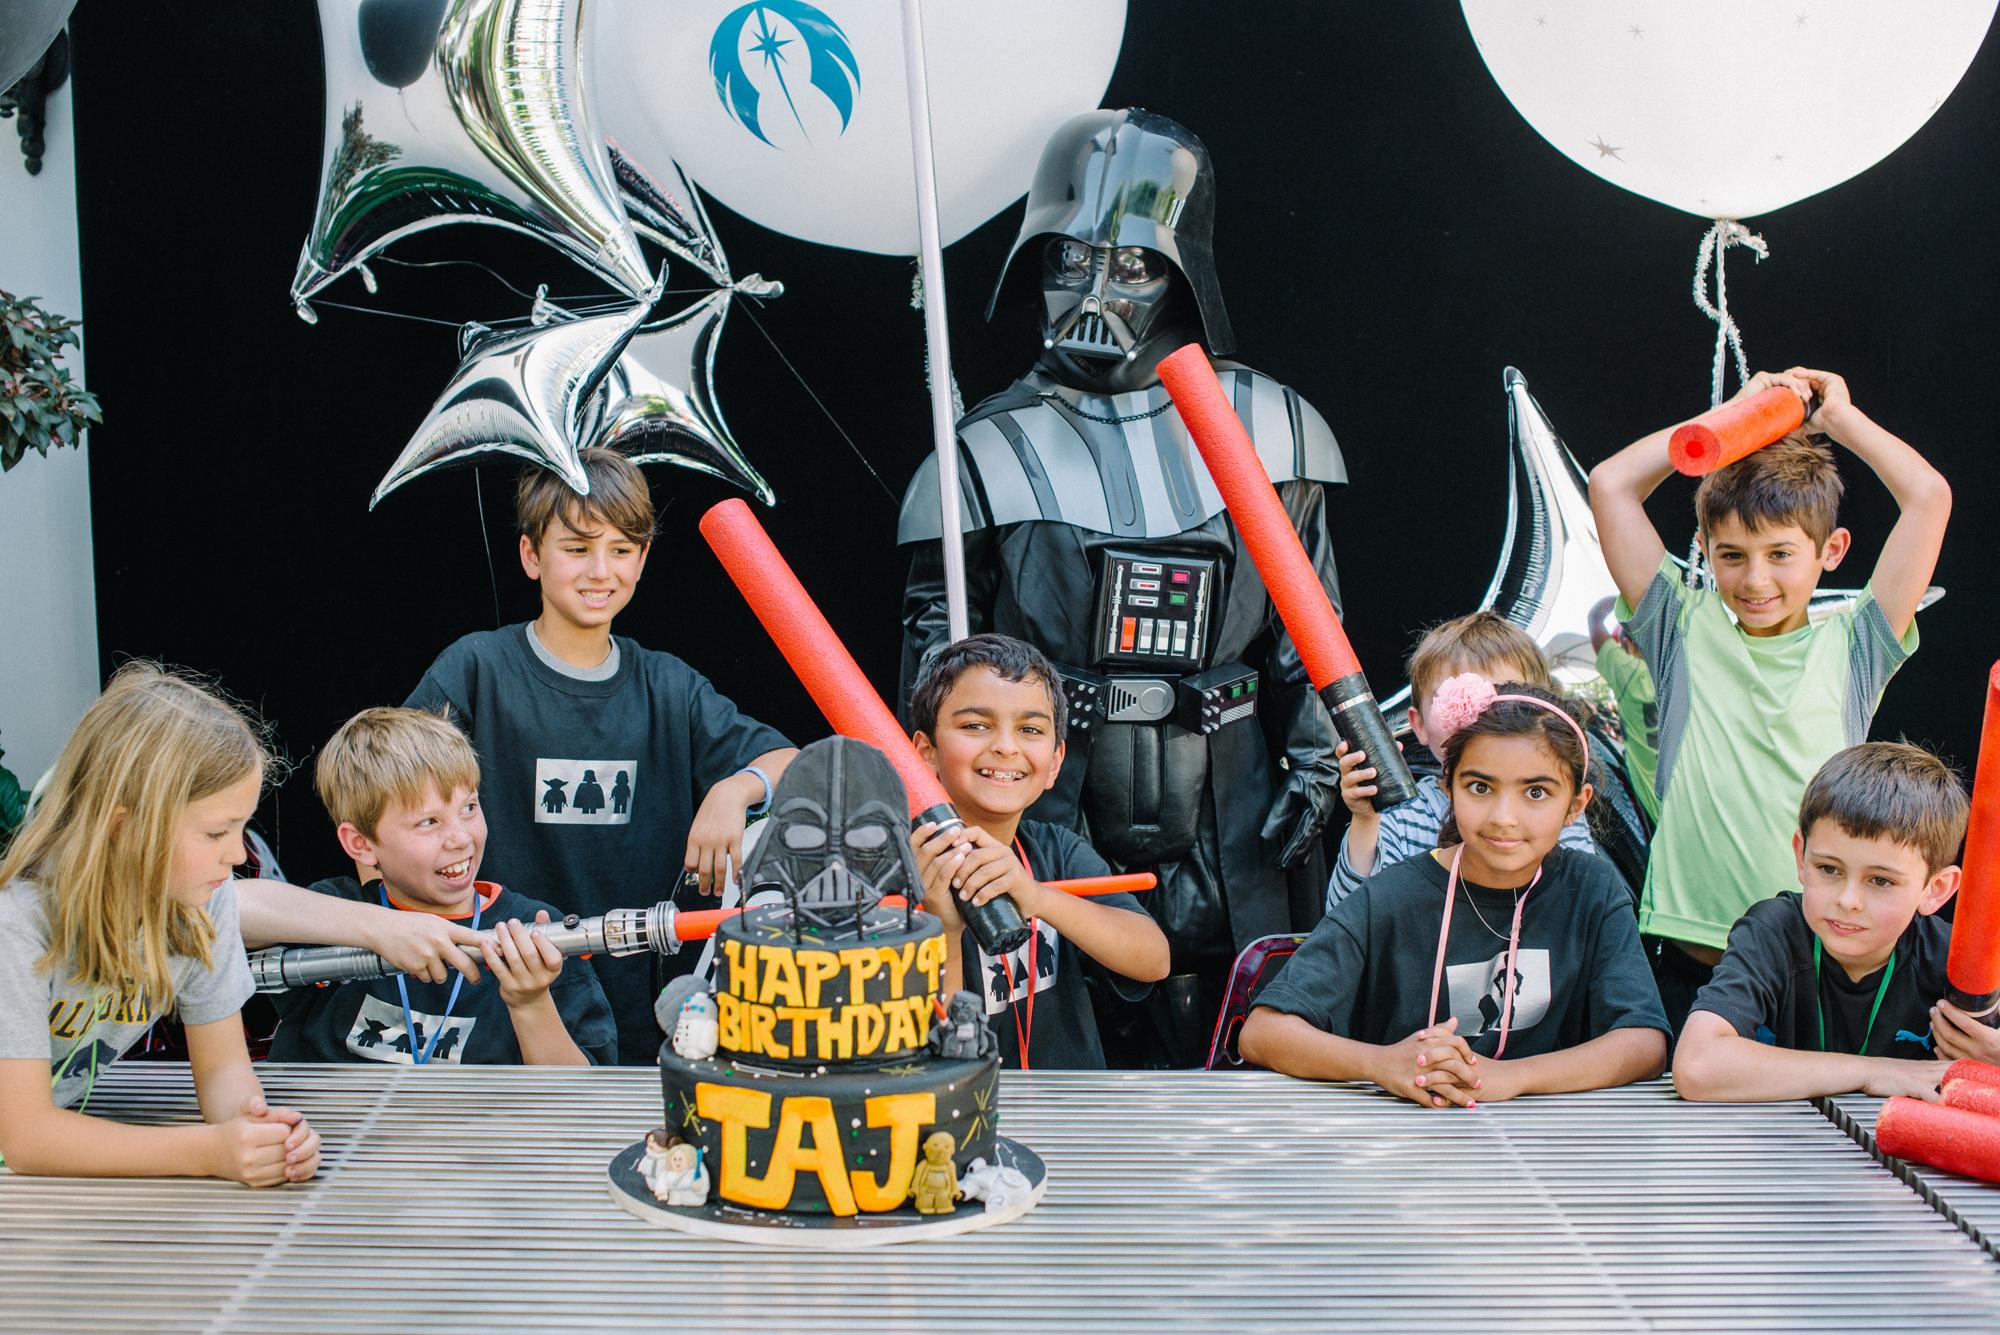 tarynco-events-starwars-kids-birthday-party-cake-time.jpg